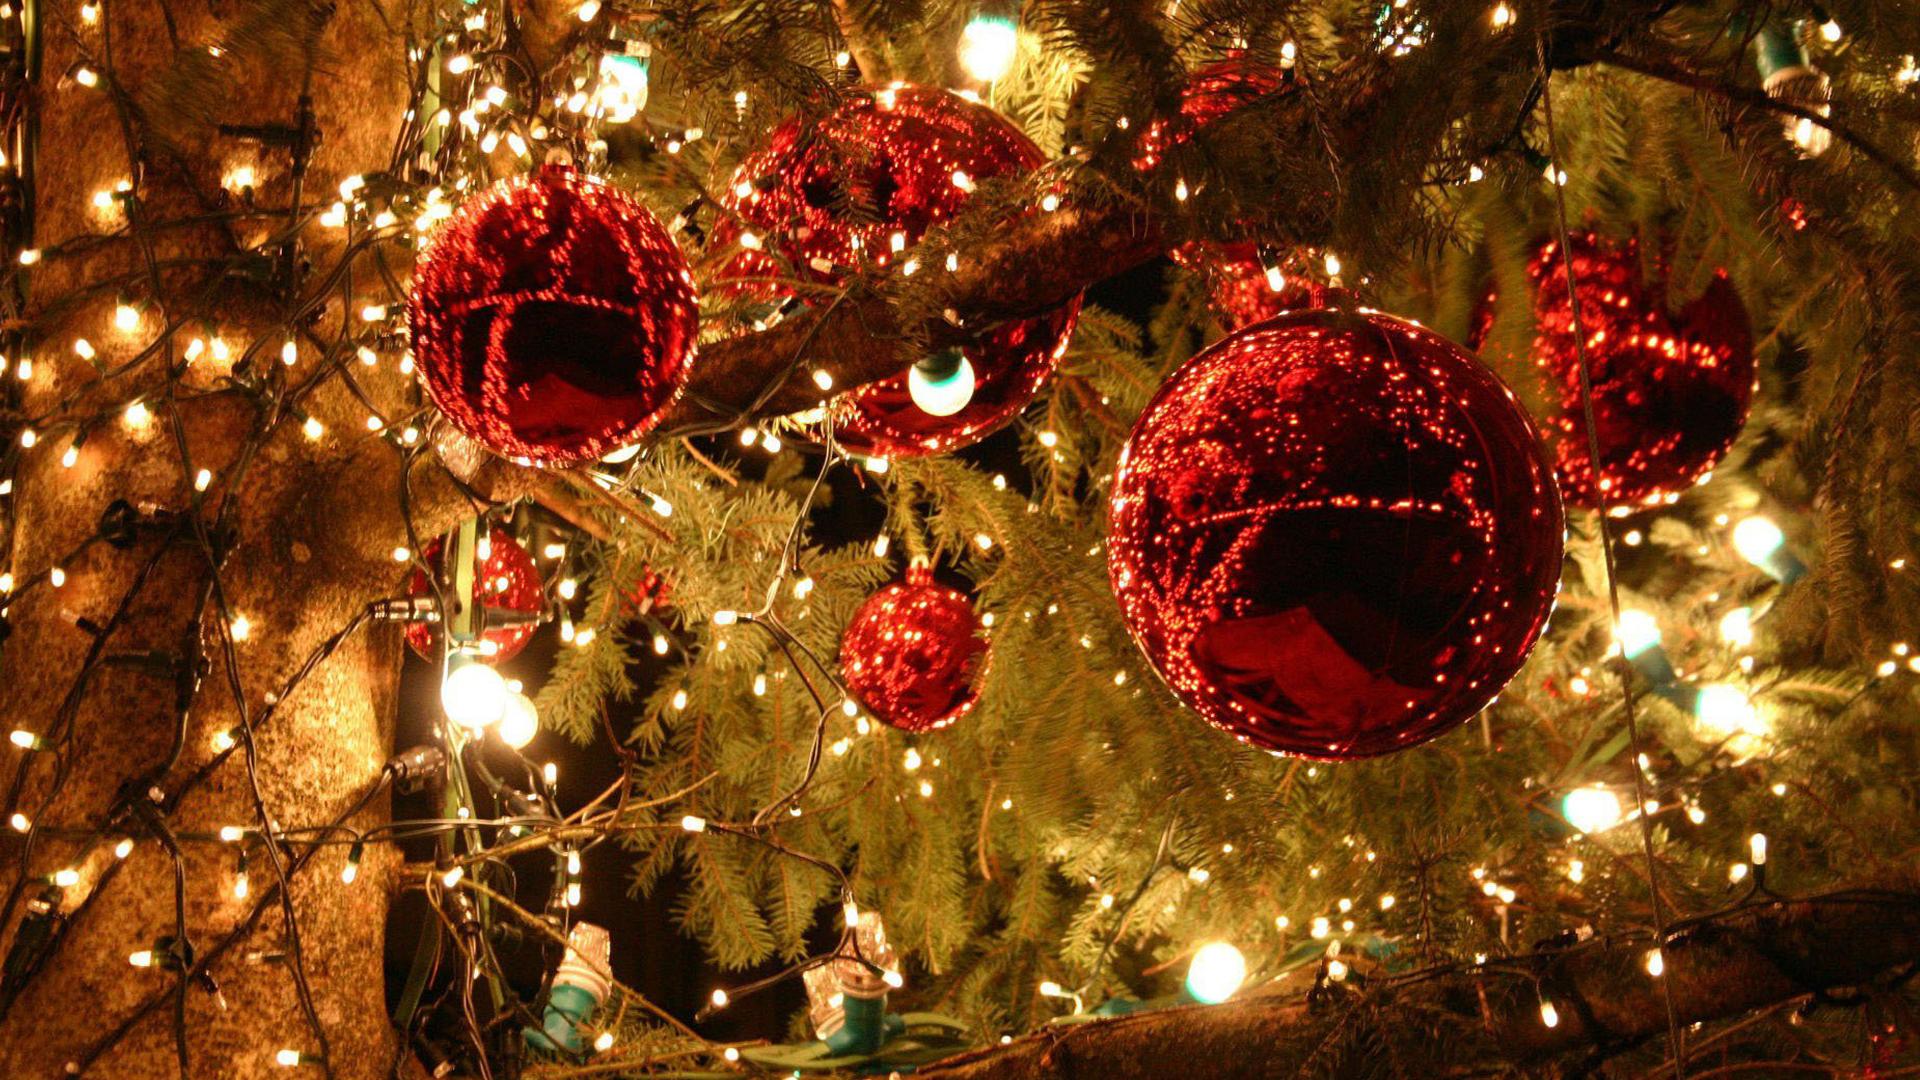 Christmas Backgrounds Best for Kodi 10